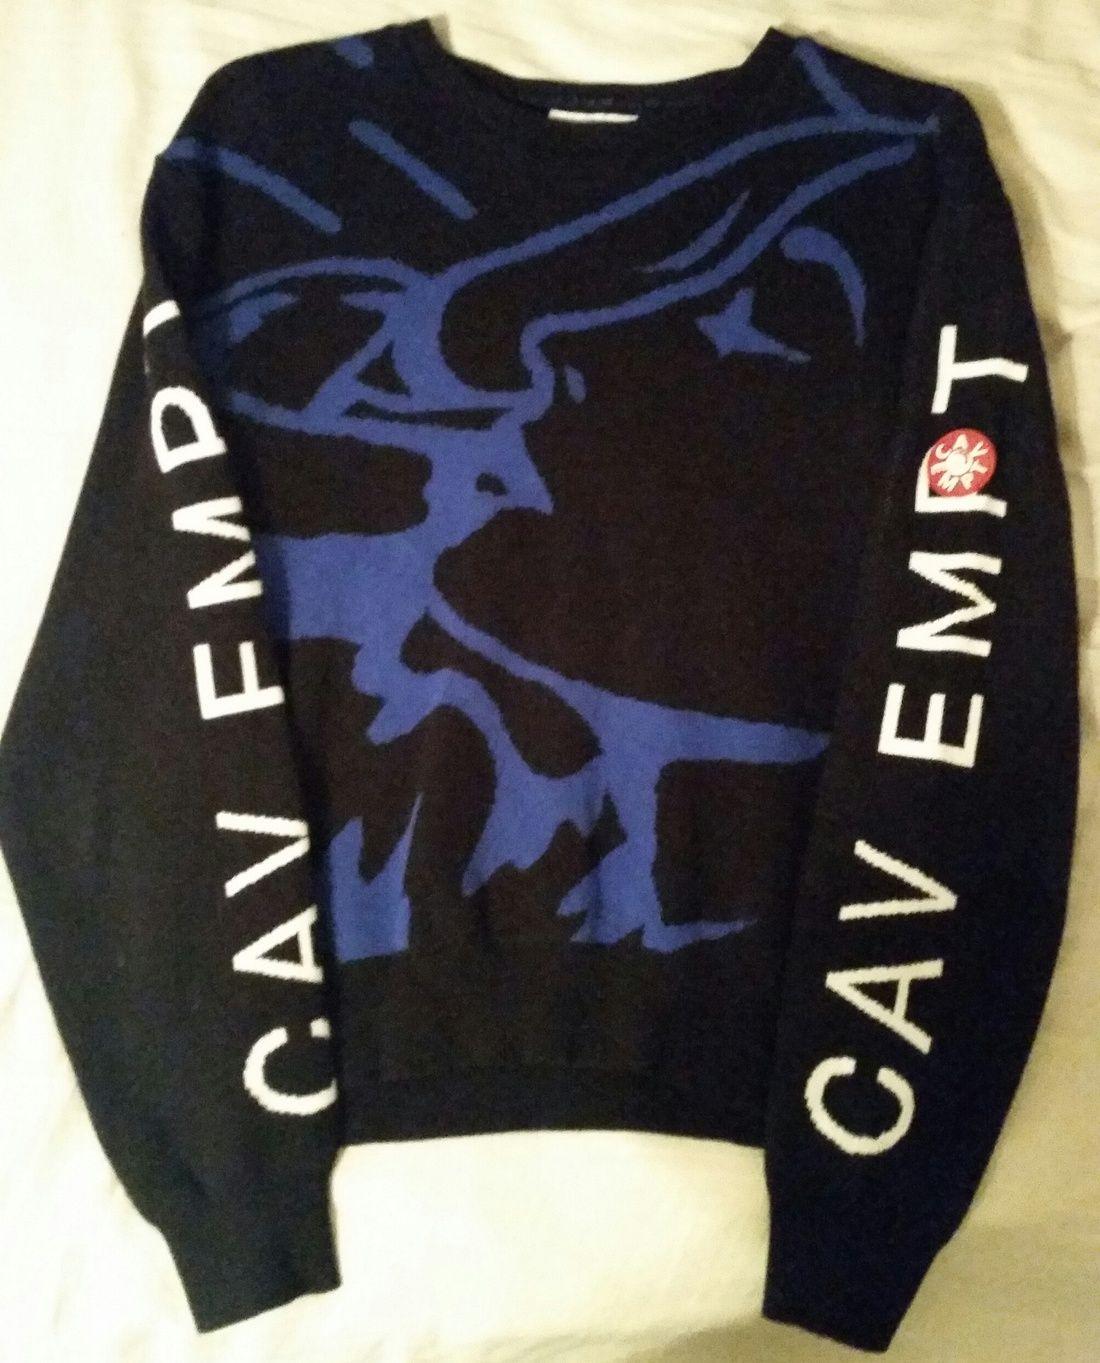 Cav Empt C.E. Intarsia Knit Sweater Final Drop Size S $121 - Grailed